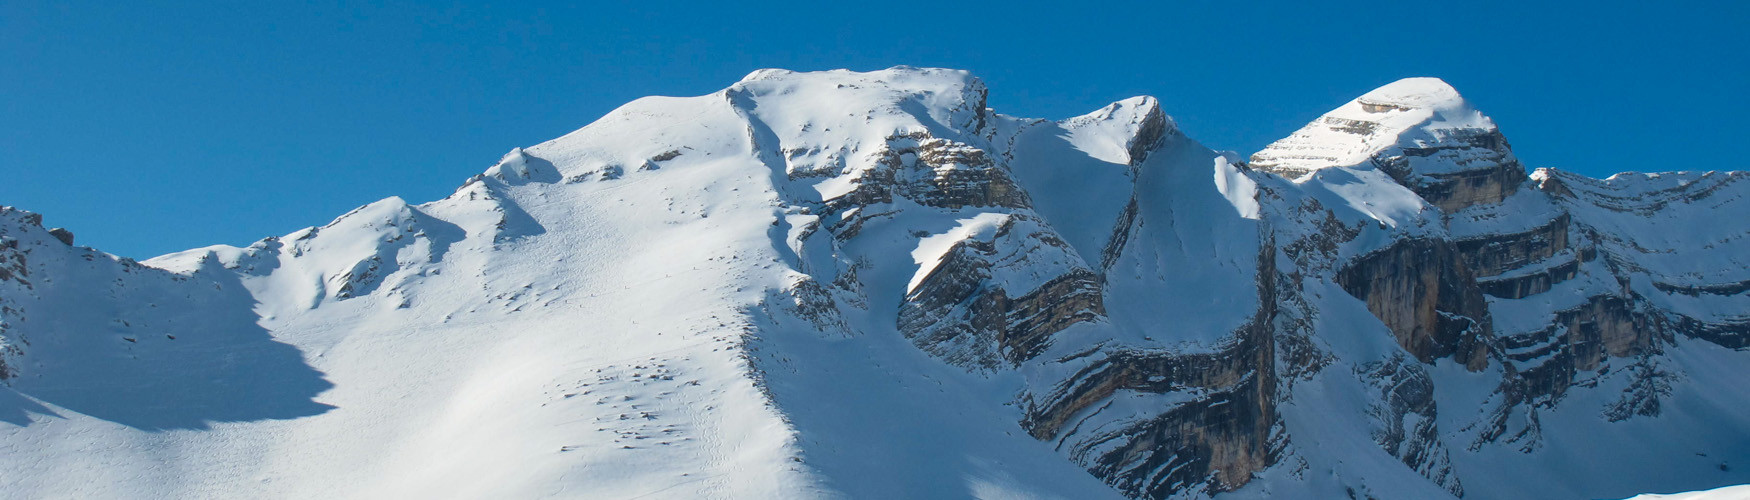 Fanes Skitouren Bergführer, Dolomiten Skitour, Dolomiten Skitour Bergführer